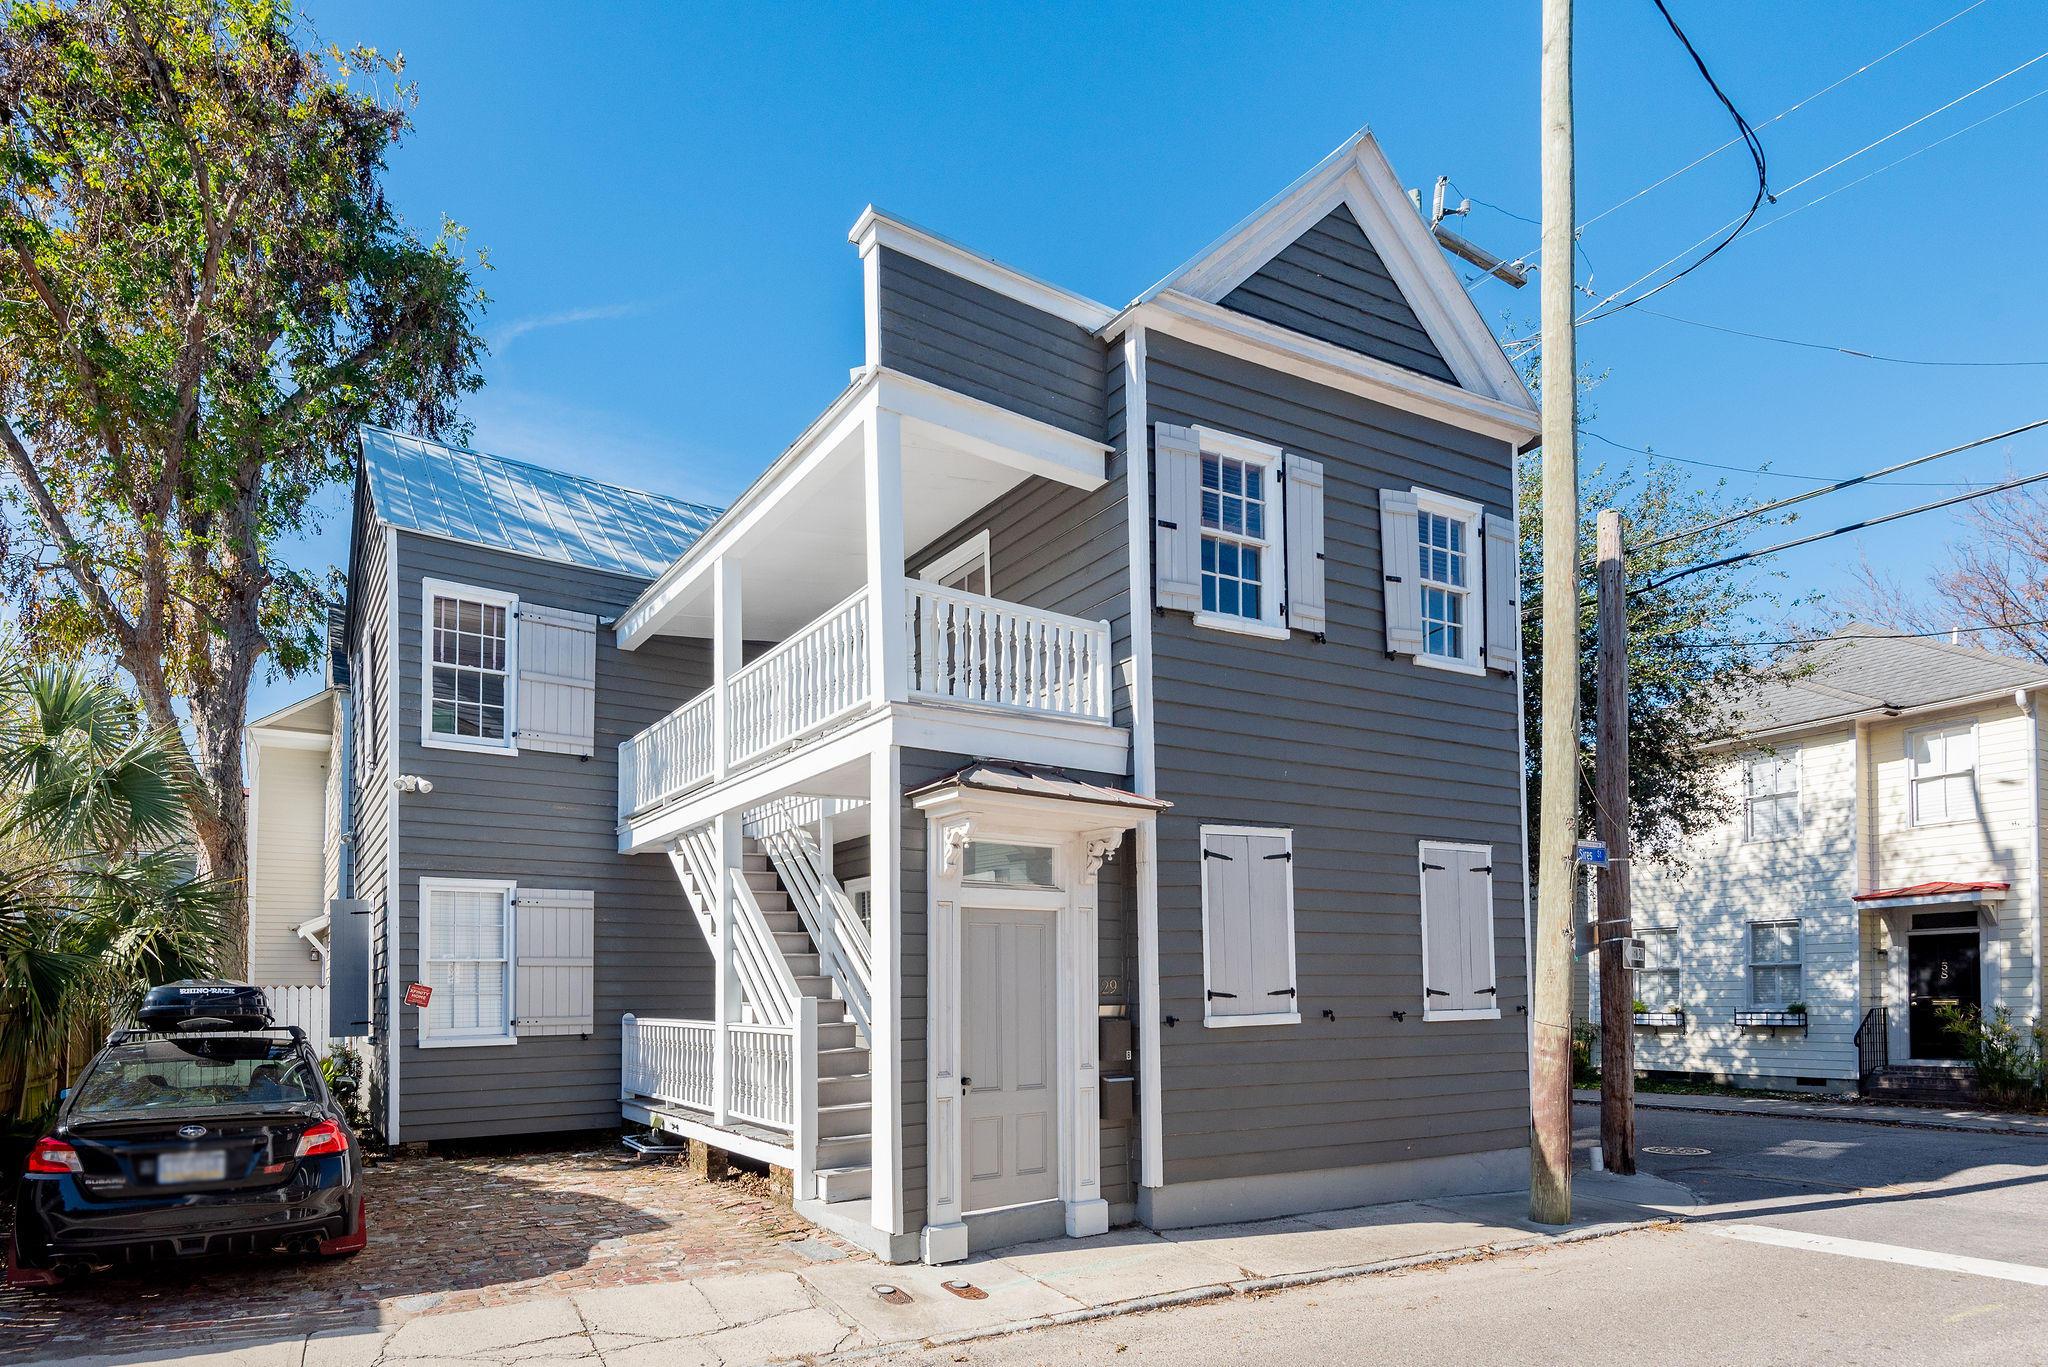 Elliotborough Homes For Sale - 29 Sires, Charleston, SC - 16